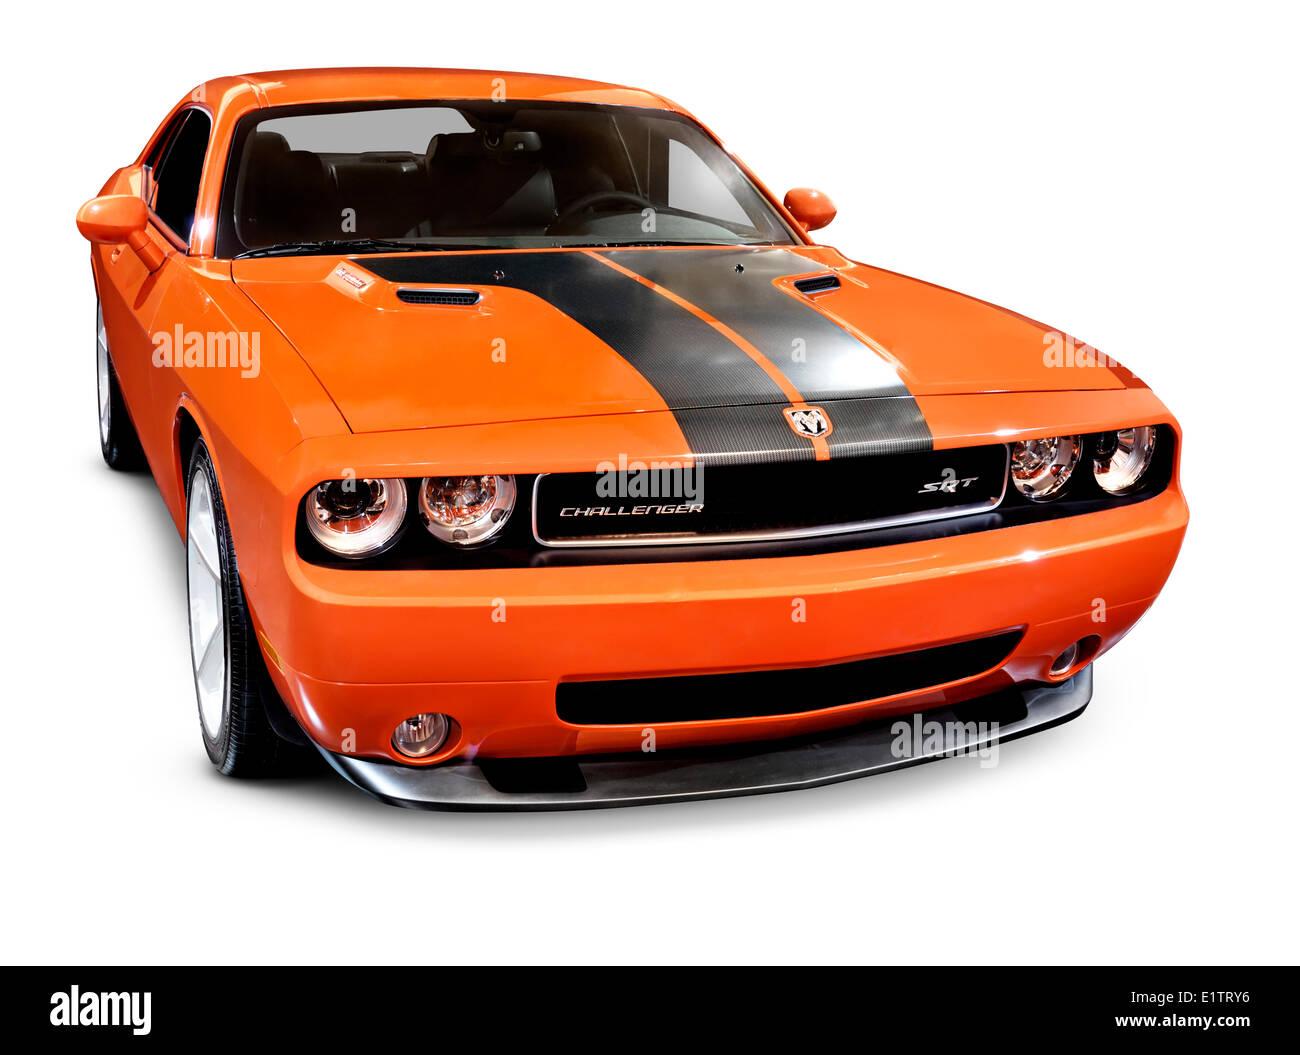 Orange 2008 Dodge Challenger Srt Muscle Car Isolated On White Stock